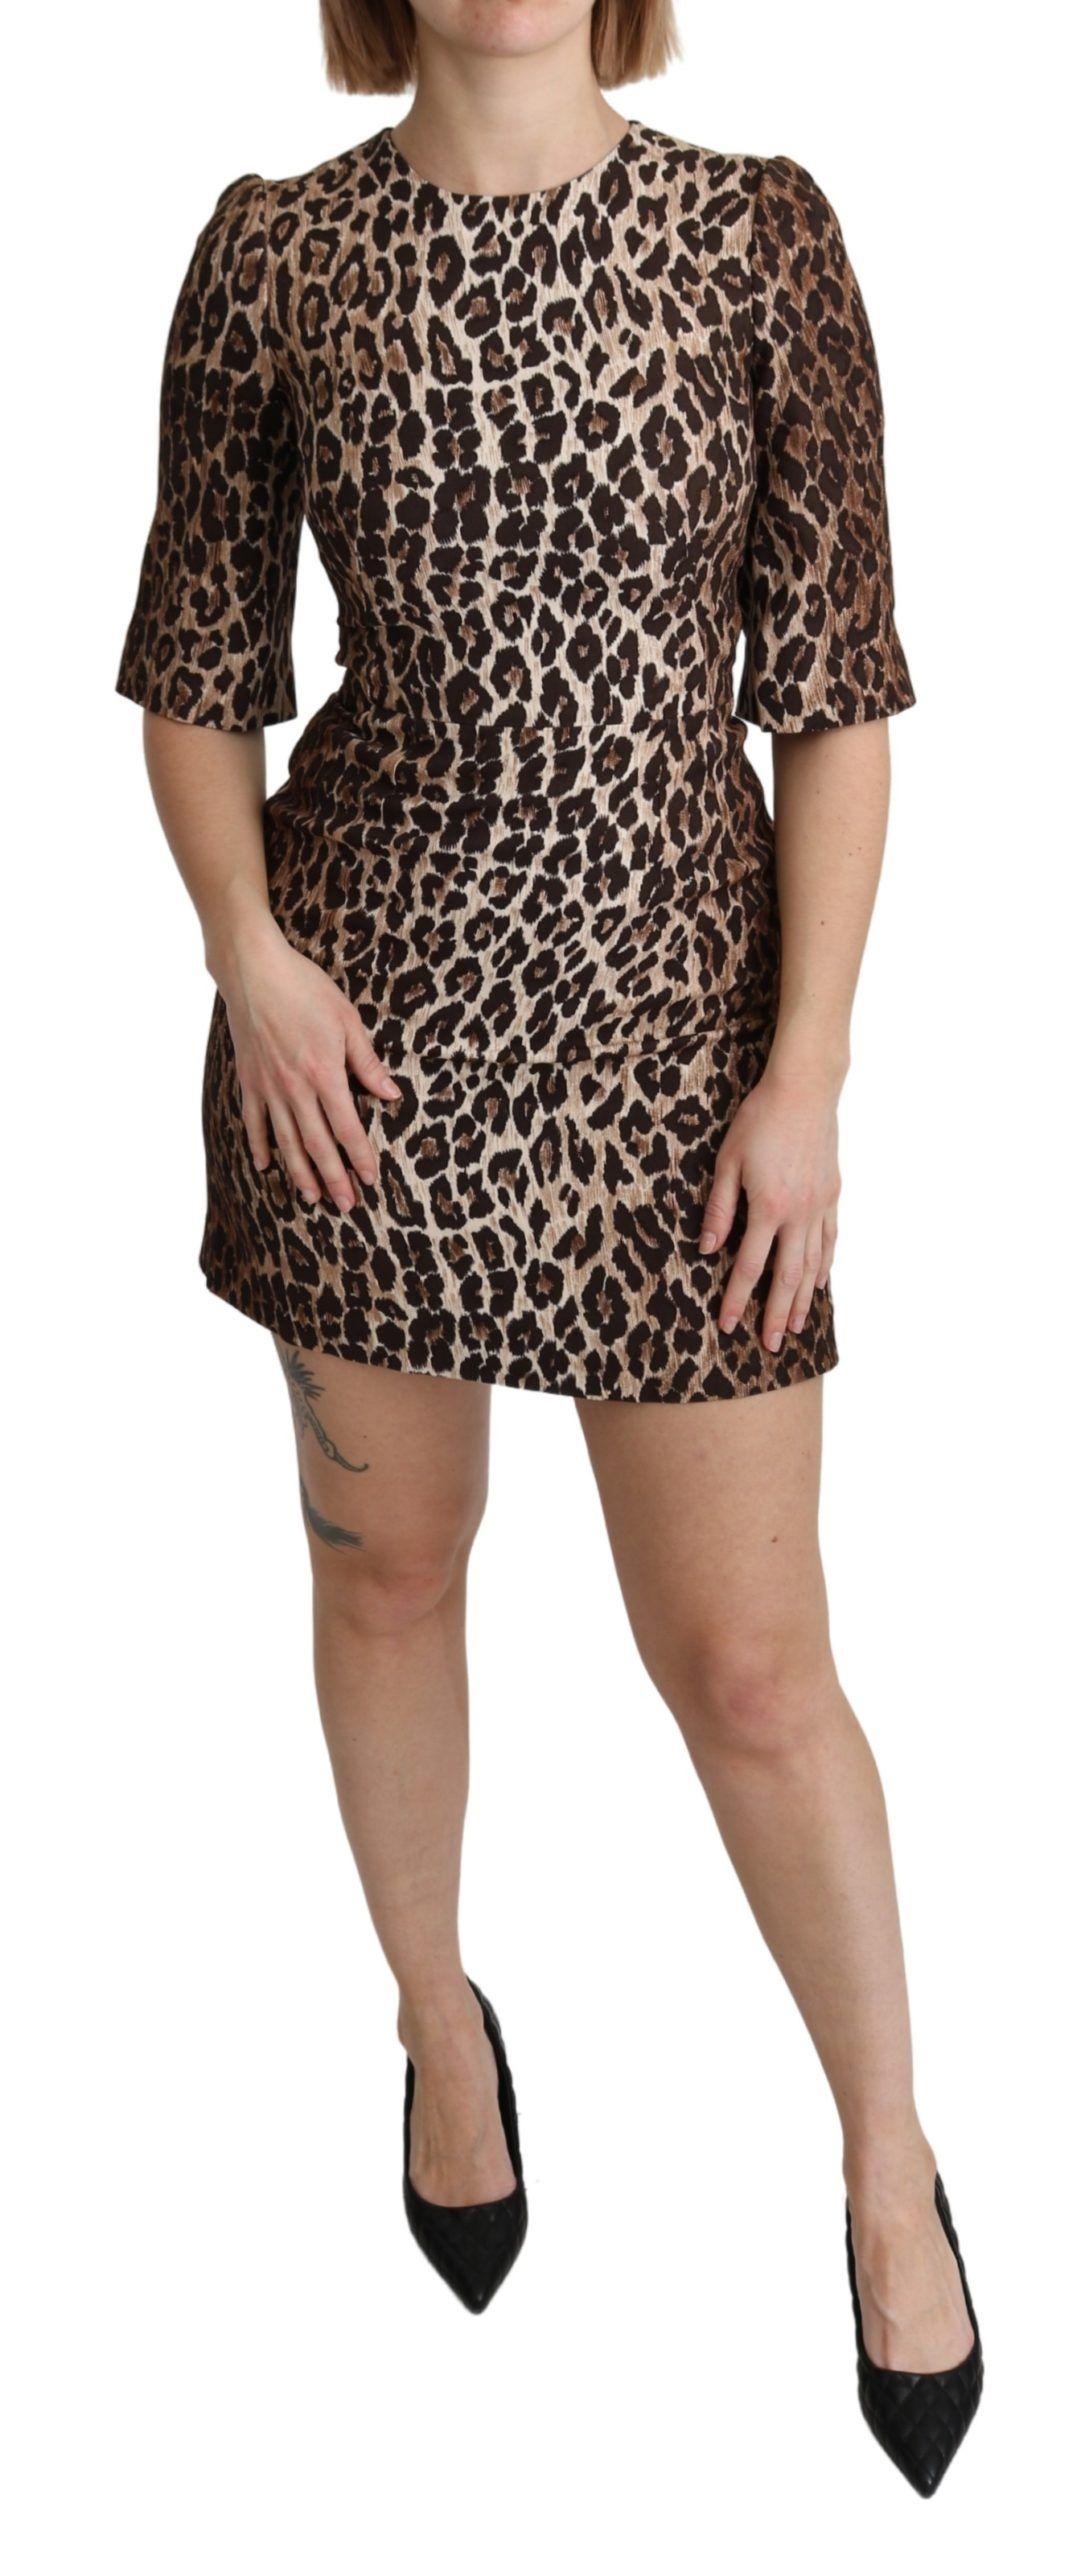 Dolce & Gabbana Brown Leopard Print Sheath Mini Stretch Dress